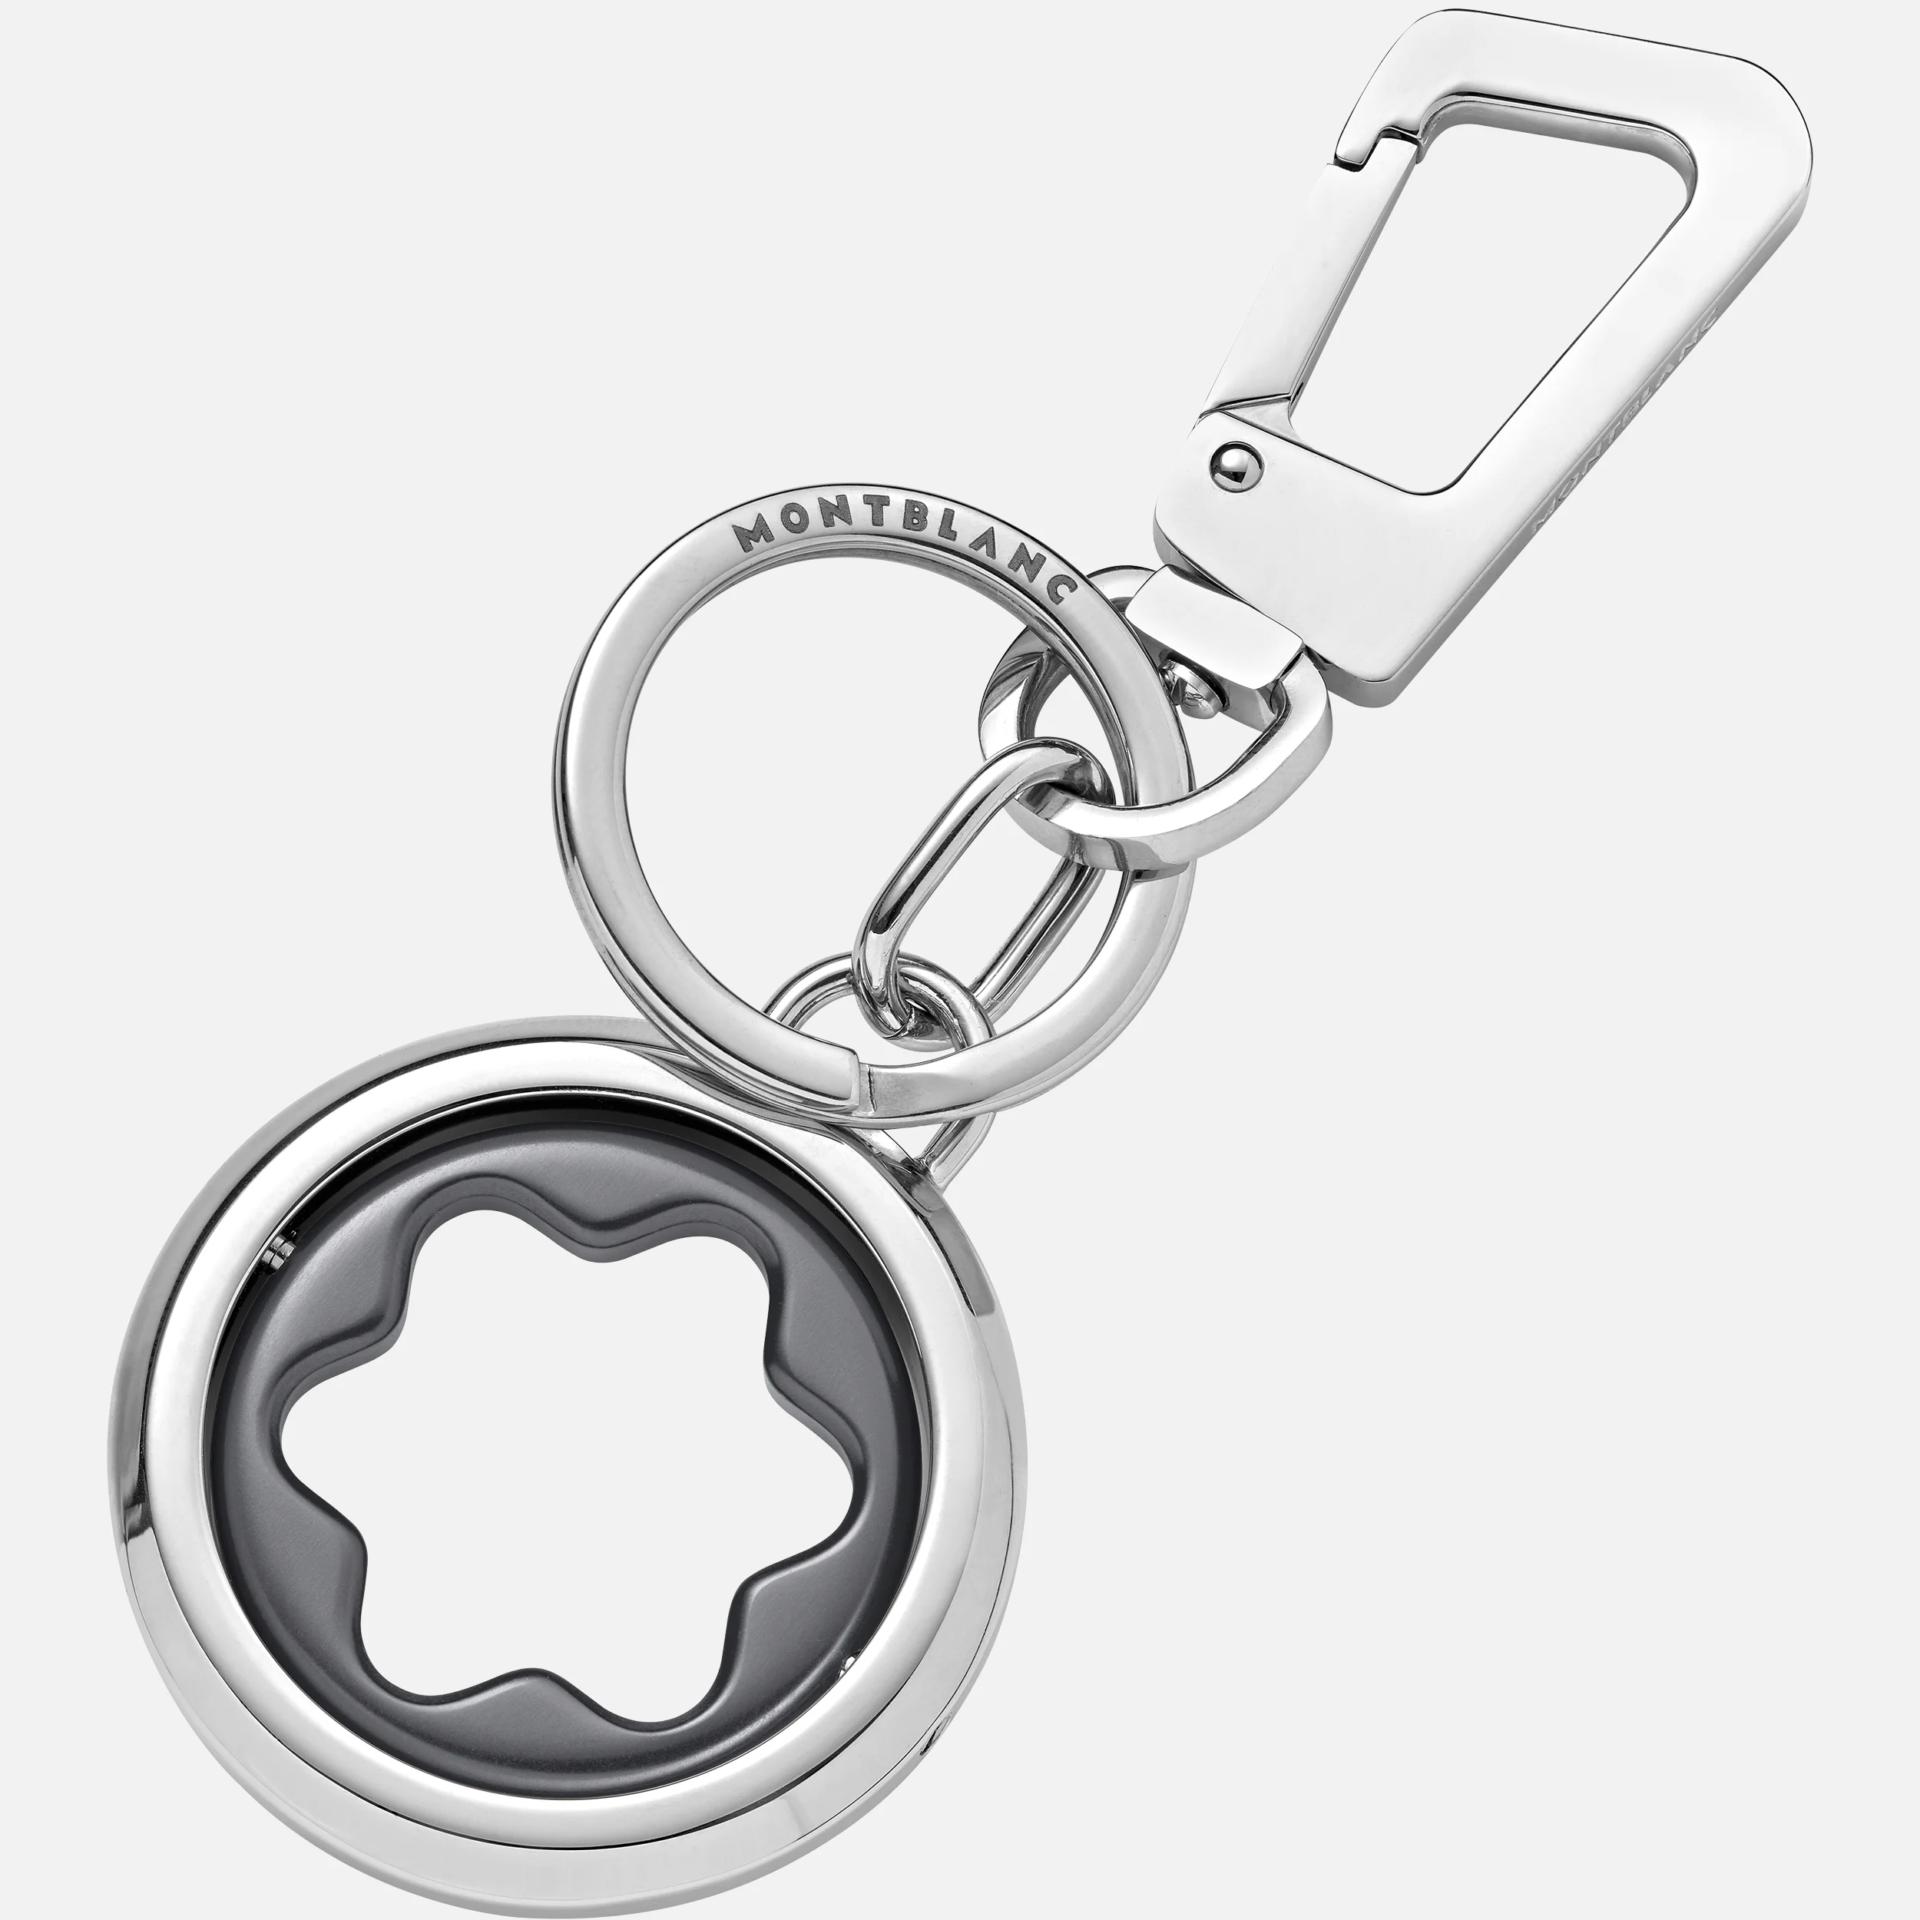 Porte-clés Meisterstück Spinning Emblem, Montblanc